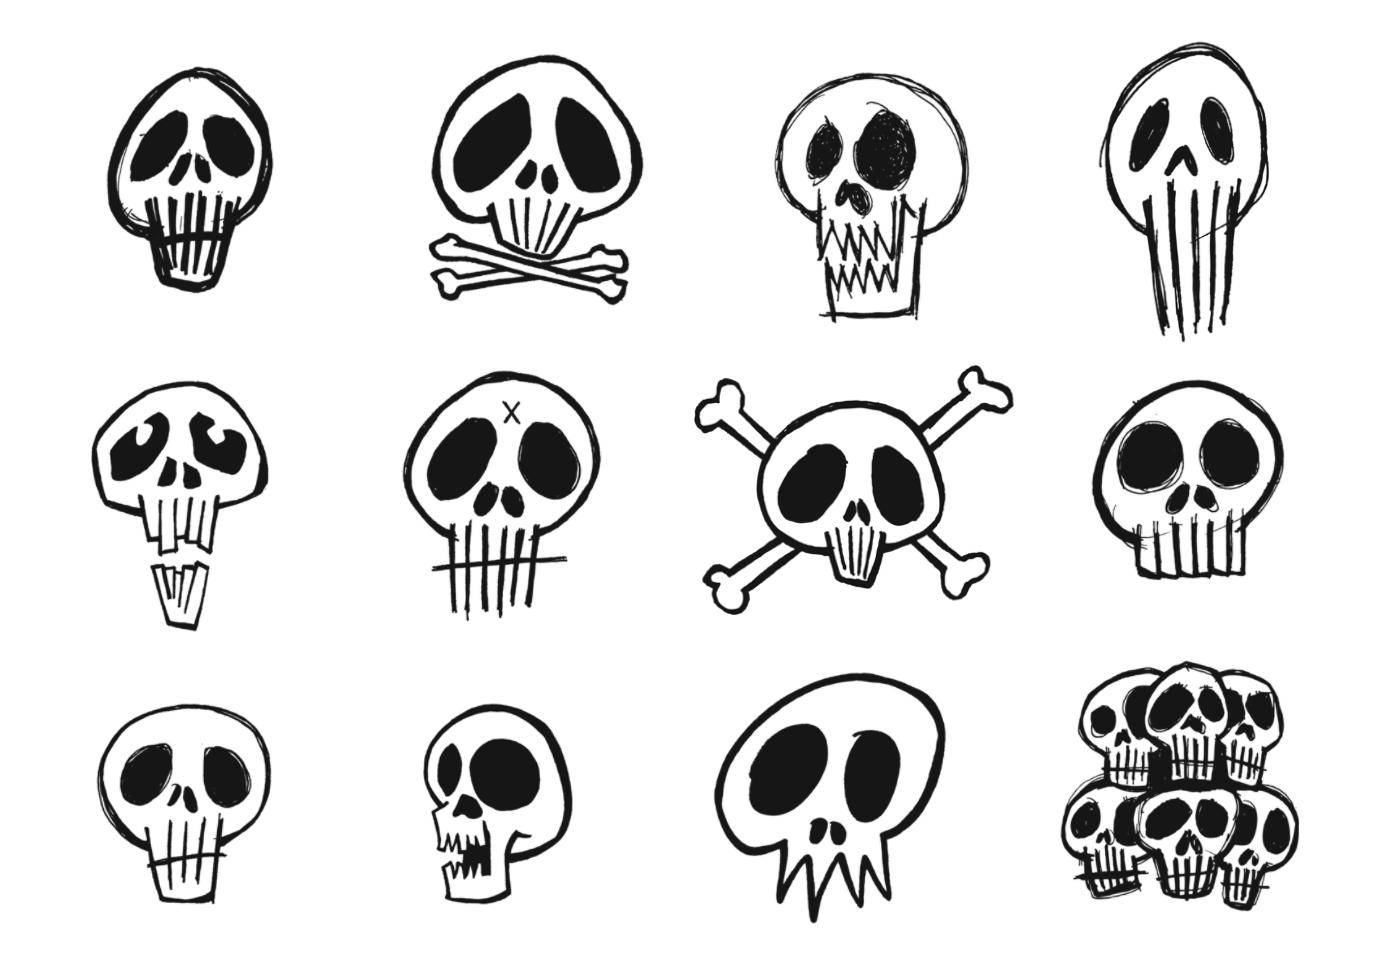 Sketchy-skull-vector-pack